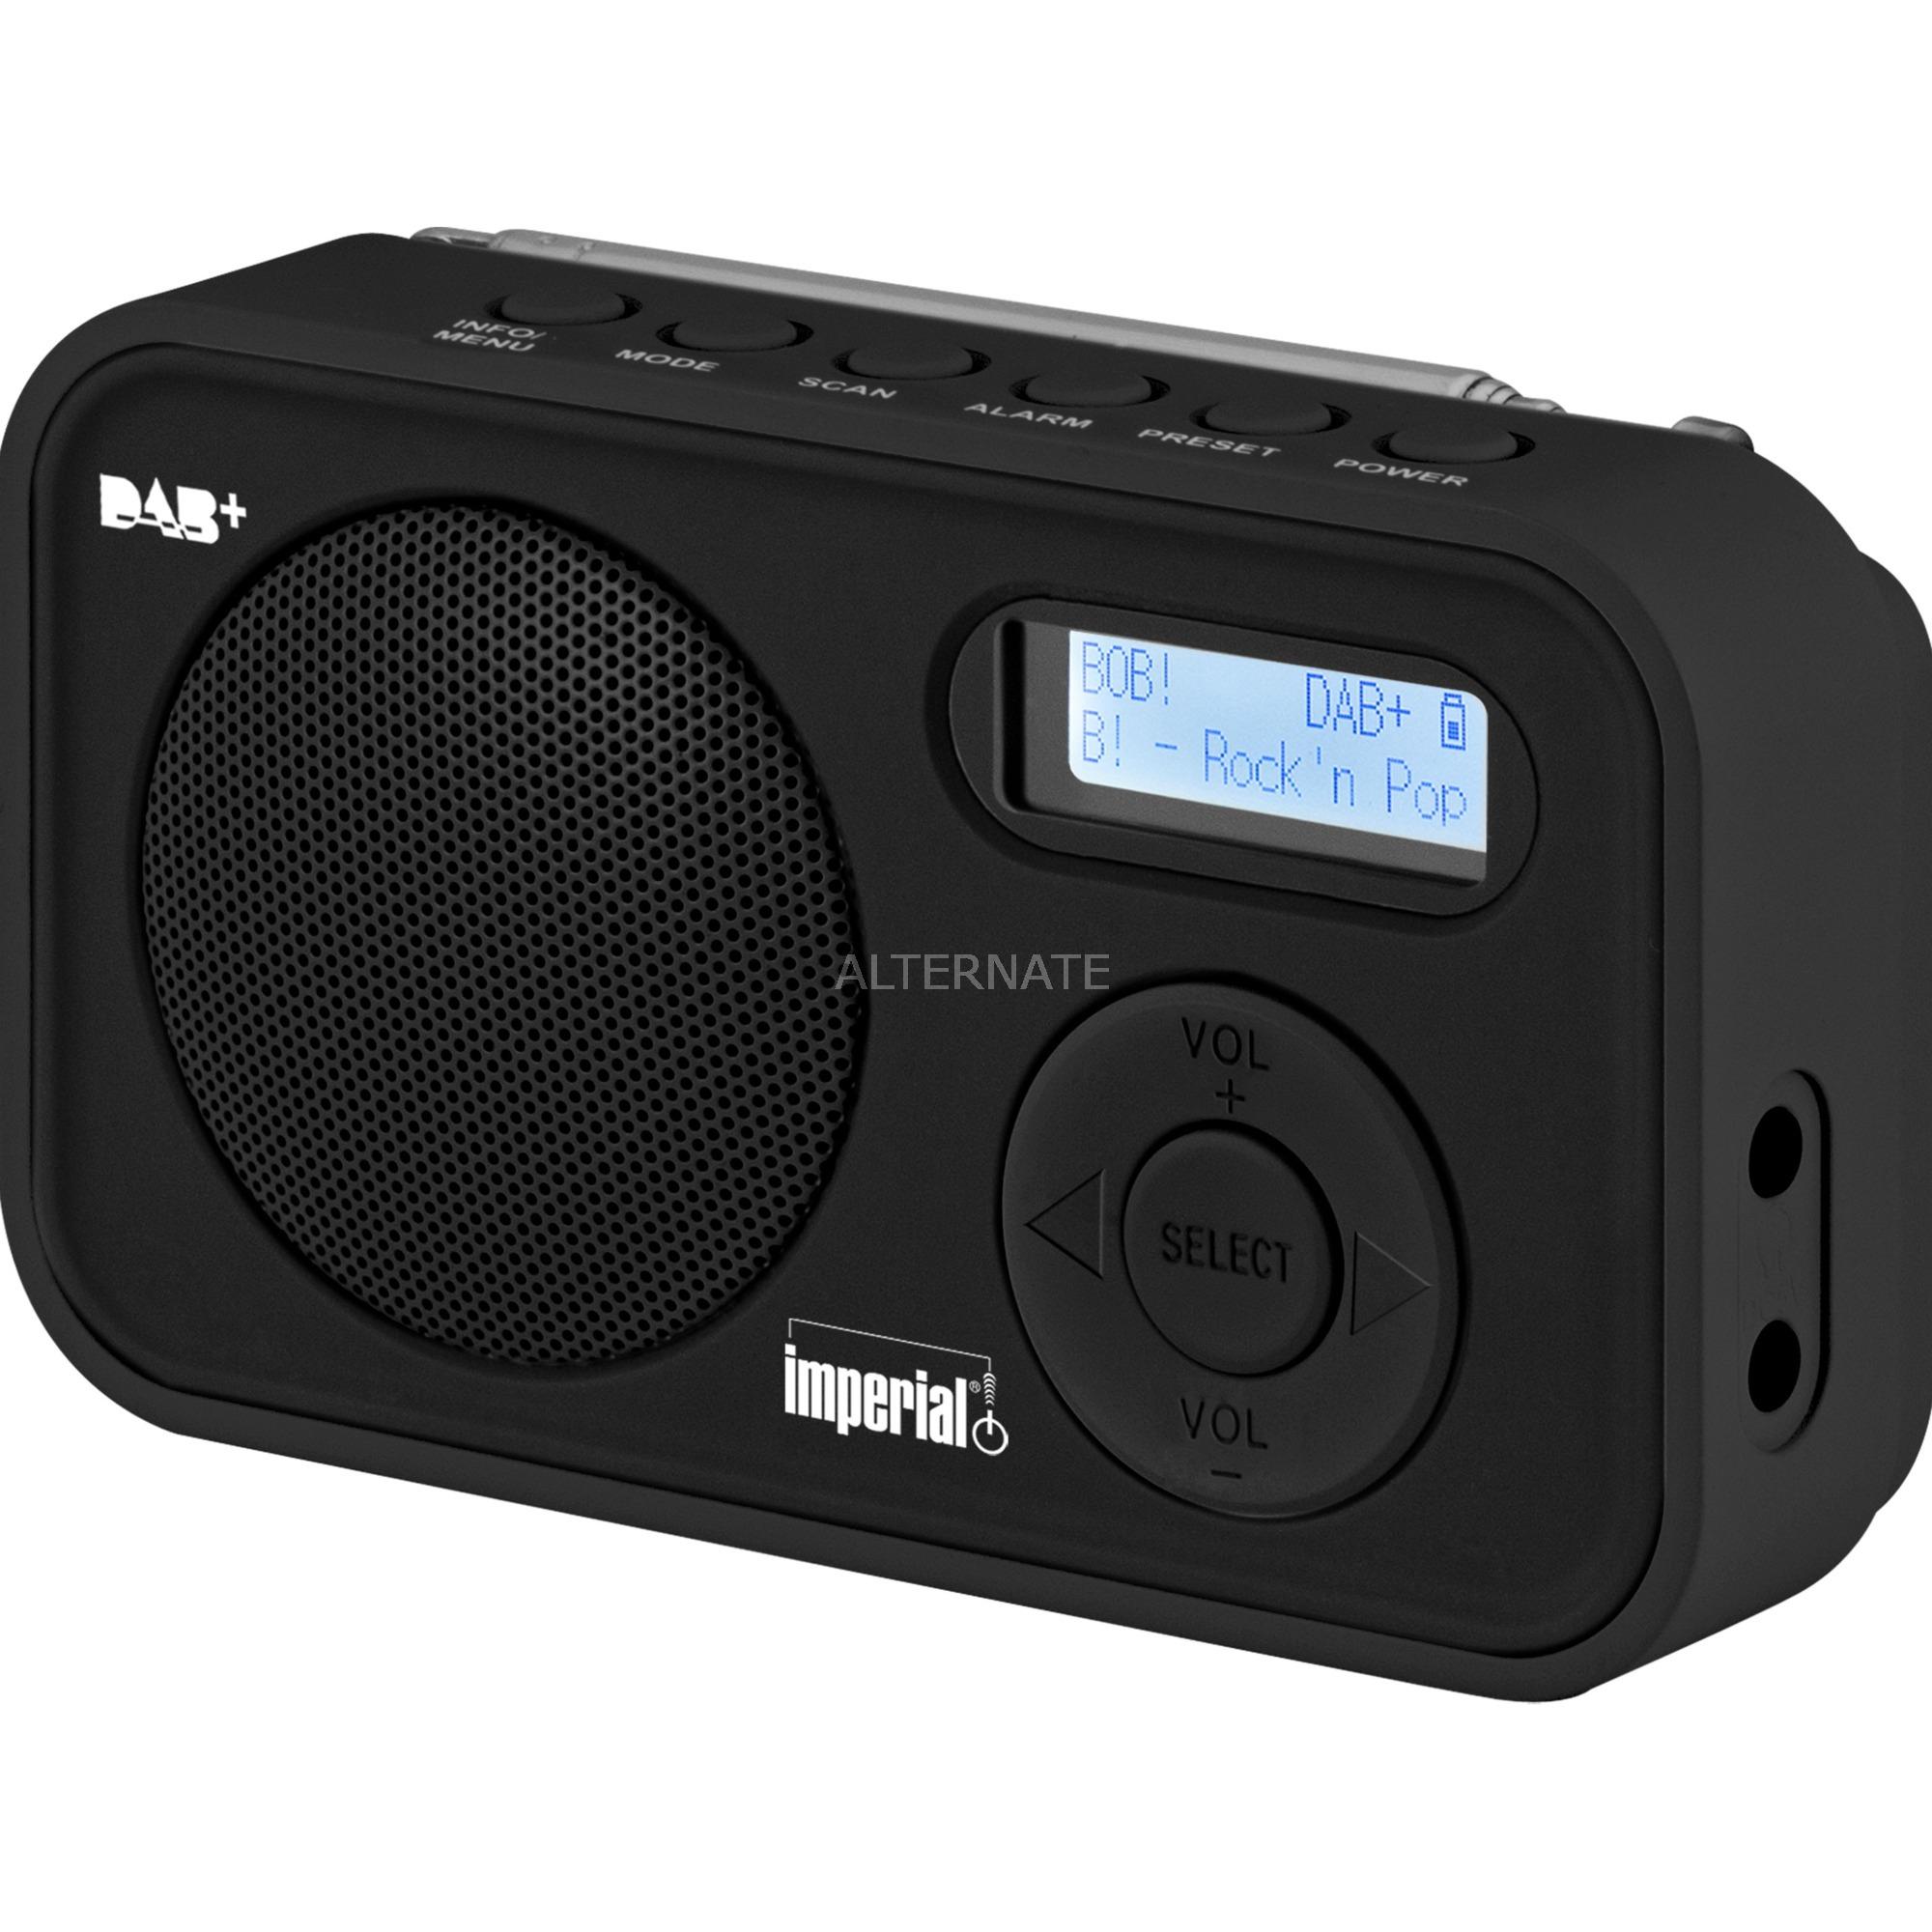 Dabman 12 radio Portátil Analógico y digital Negro